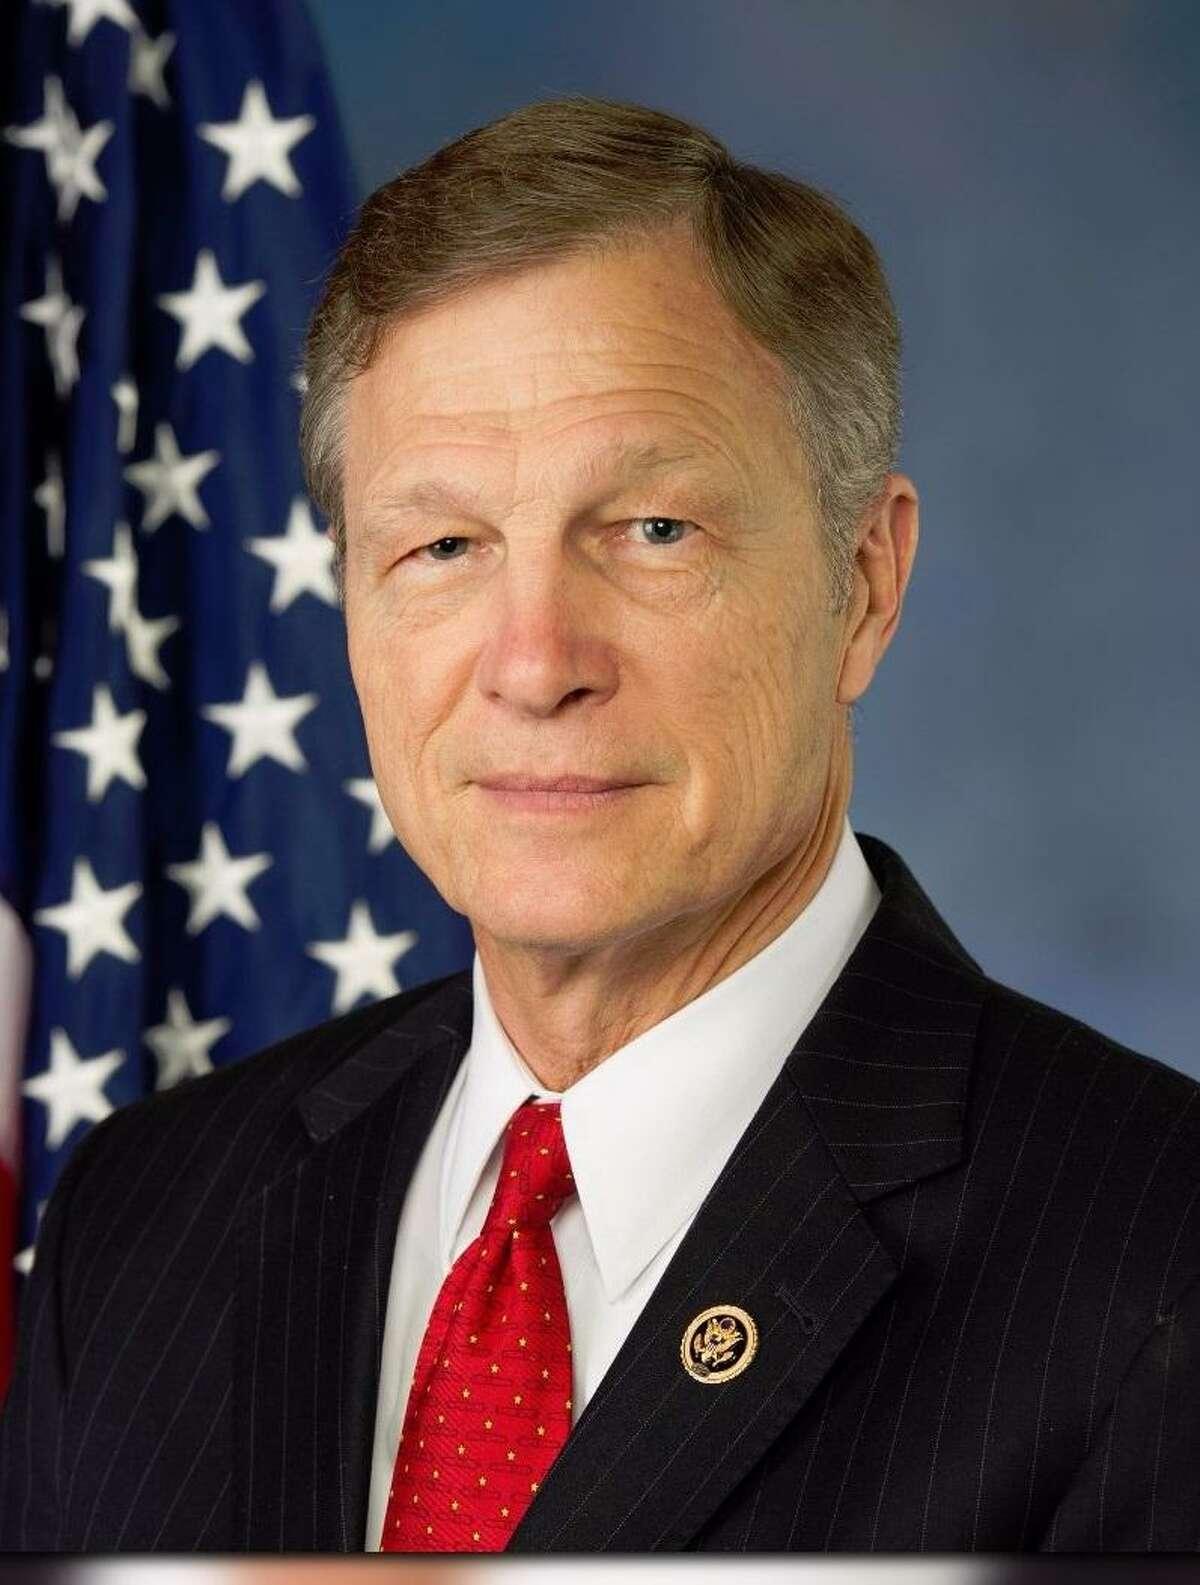 Dr. Brian Babin is the Republican congressman for Texas' 36th Congressional District